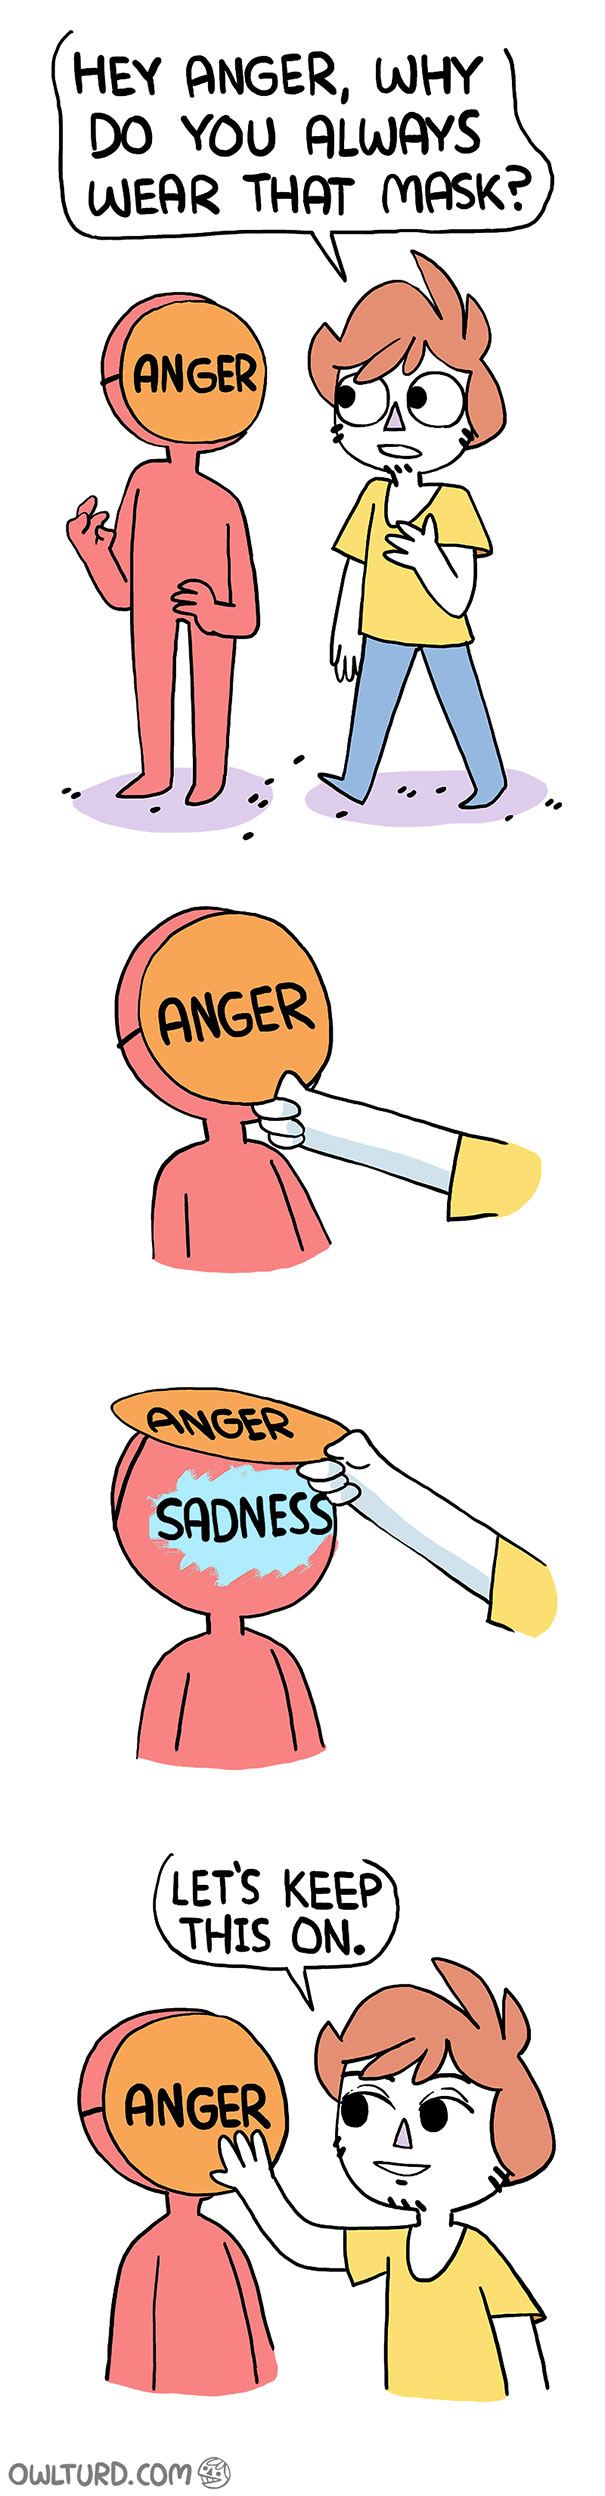 funny comics about life - photo #29